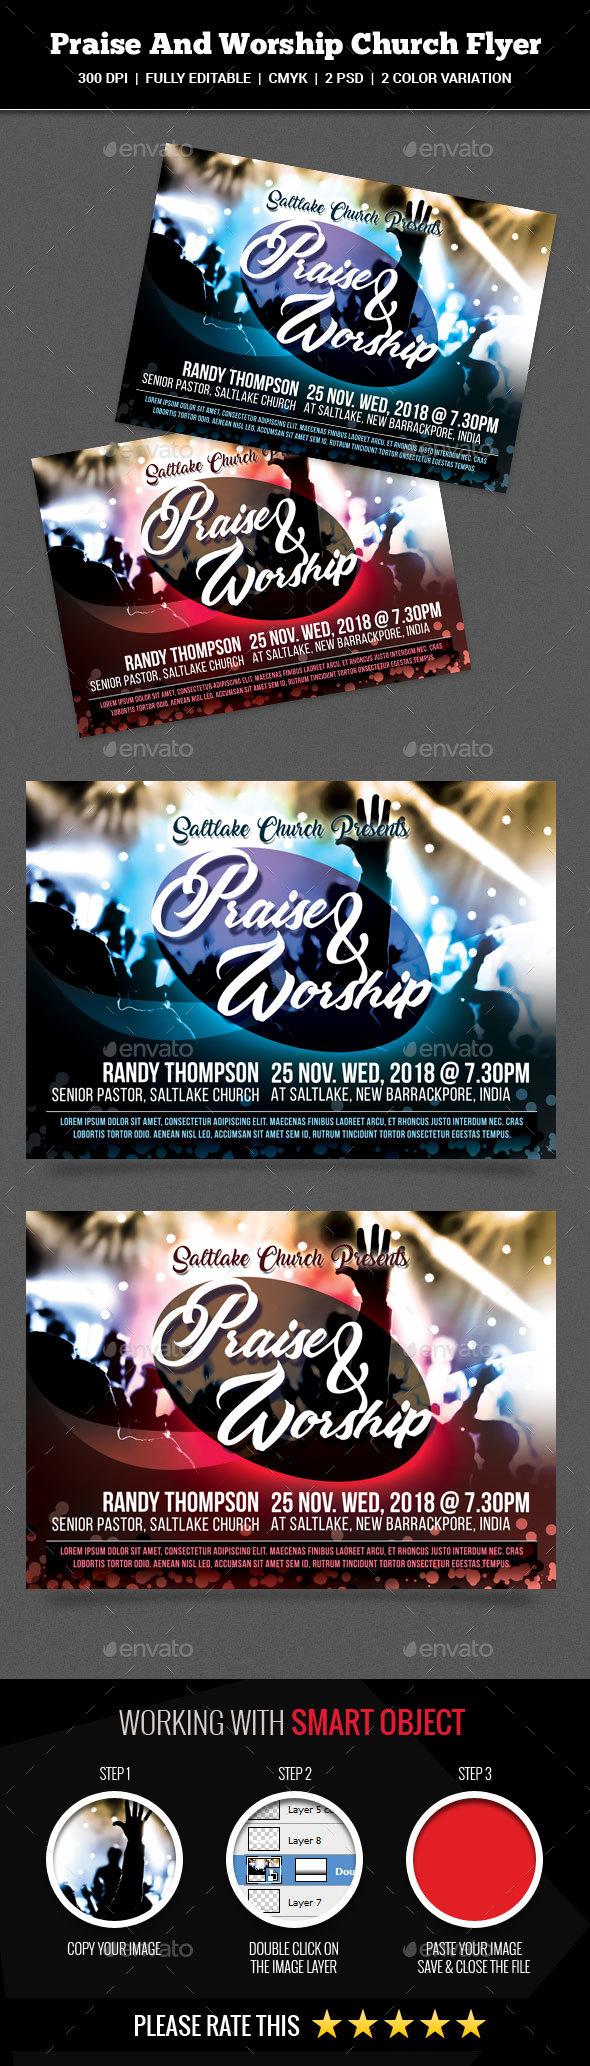 Praise And Worship Church Flyer - Church Flyers